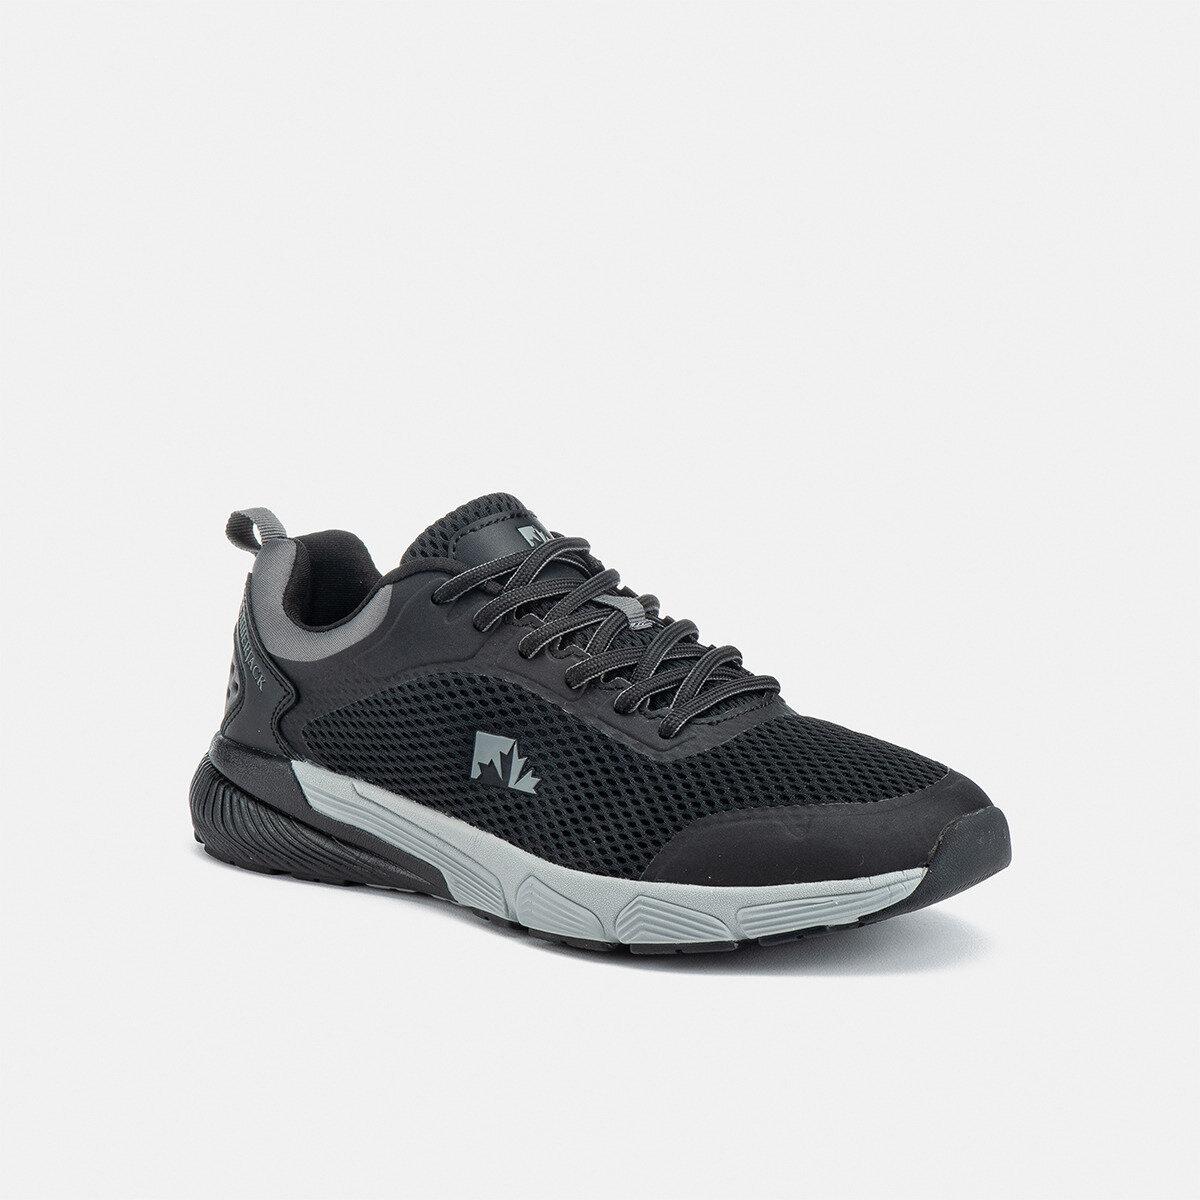 CHEN BLACK Man Running shoes